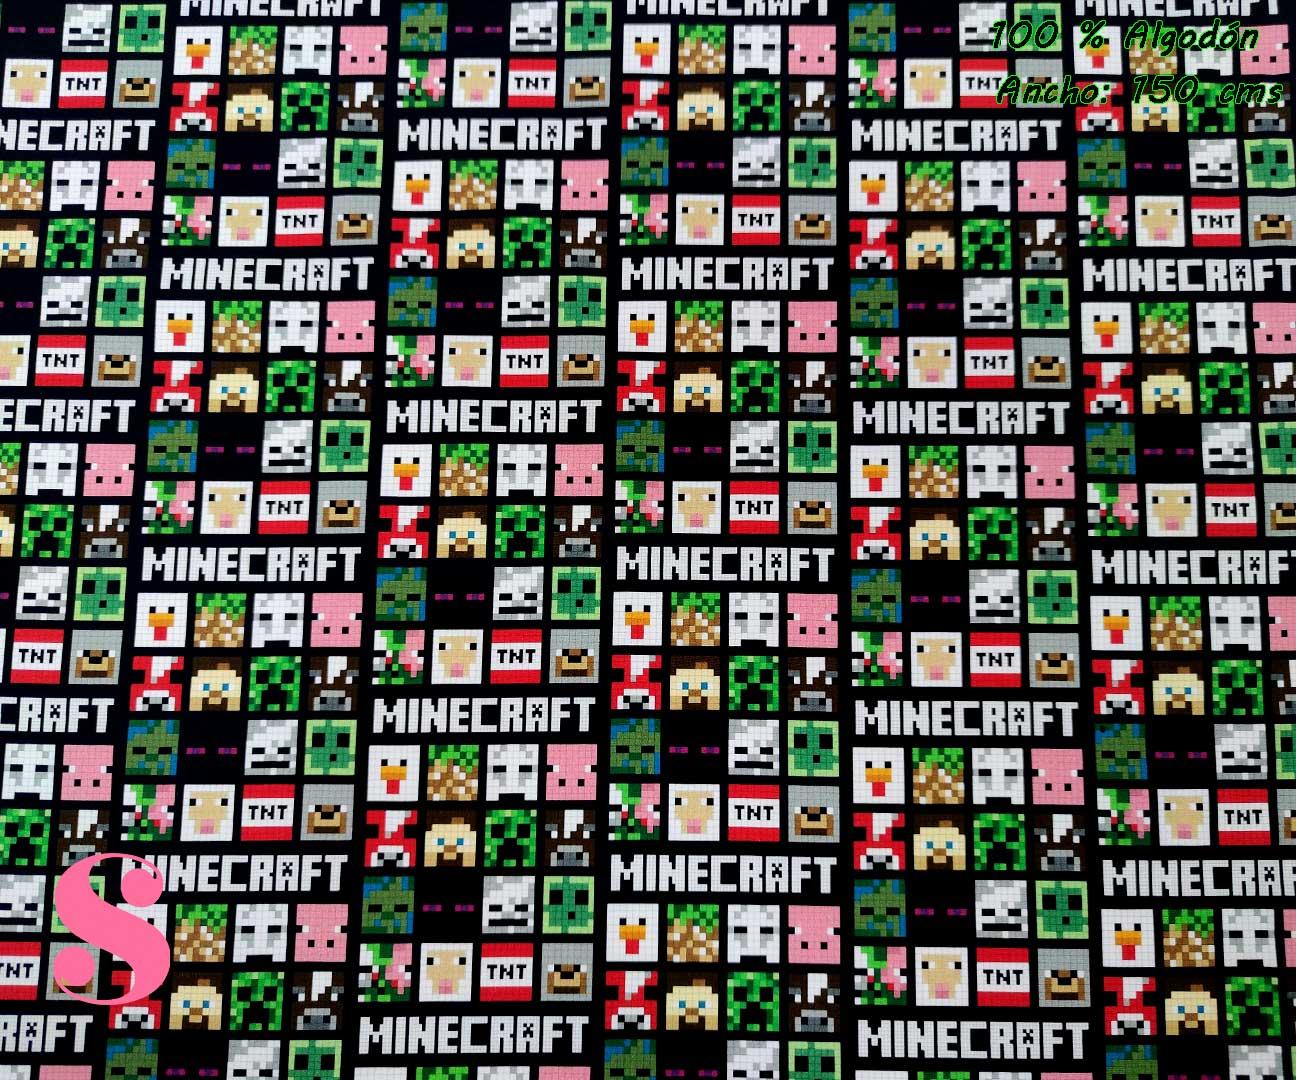 tejidos-estampados-de-algodón,-telas-frikis,telas-estampadas-de-moda,Tejido Estampado Minecraft